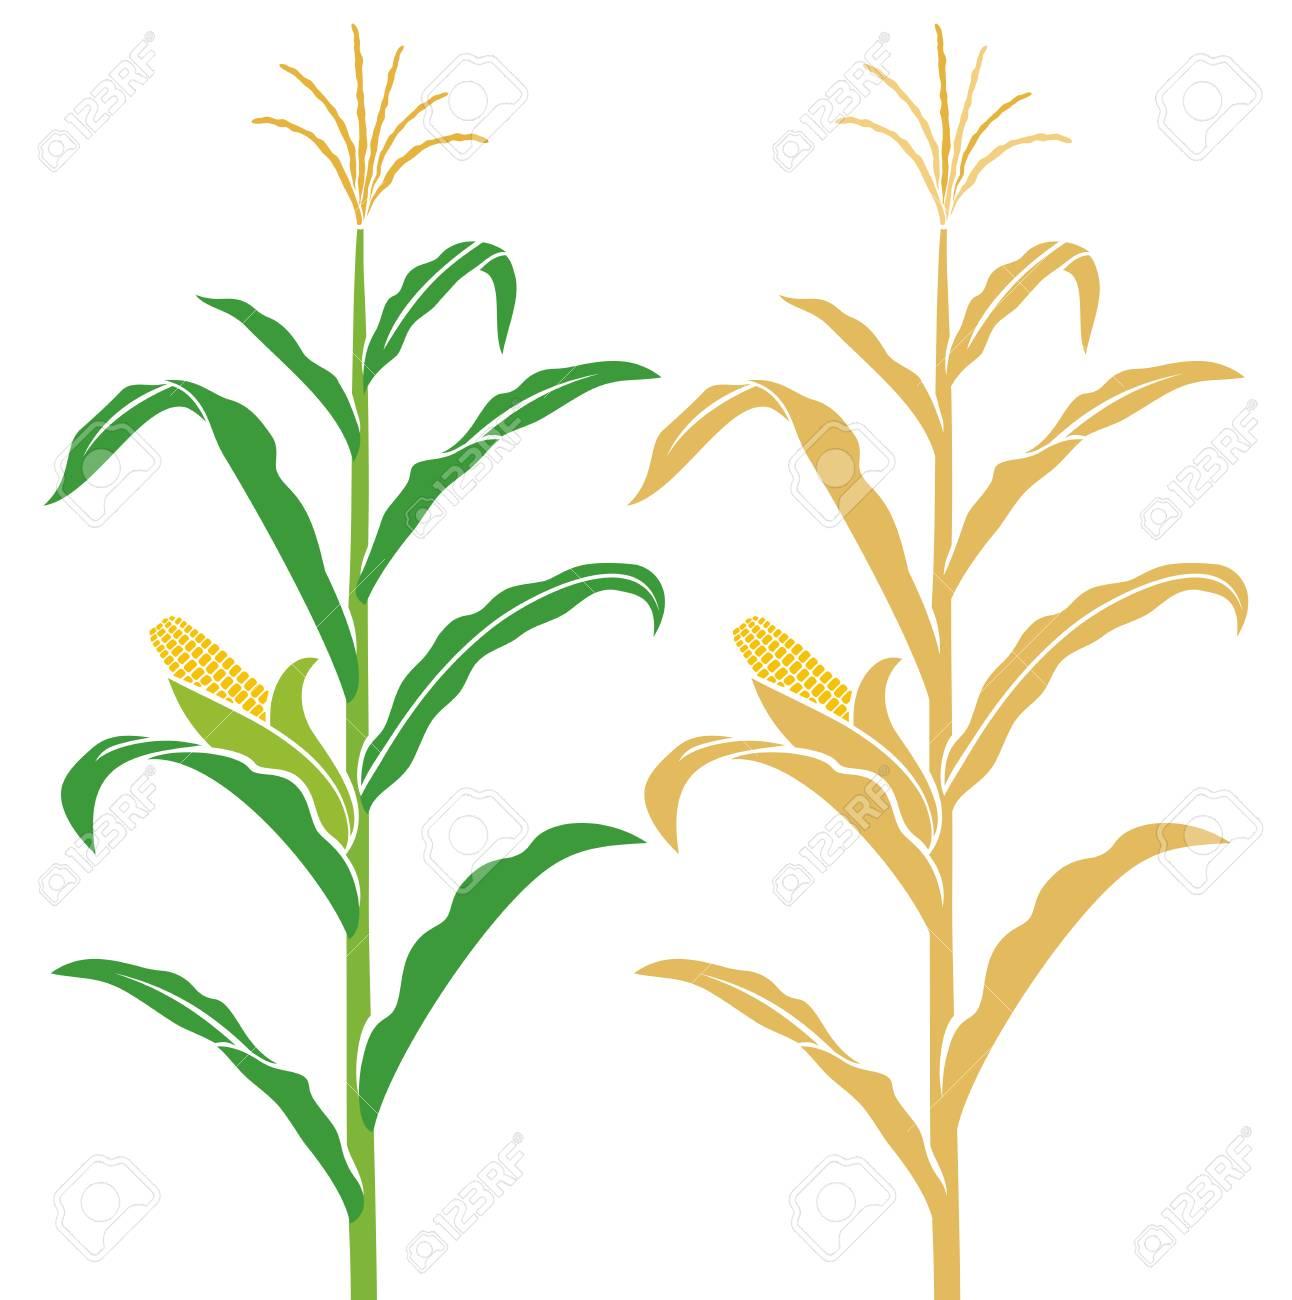 Corn stalk vector illustration. - 88415220